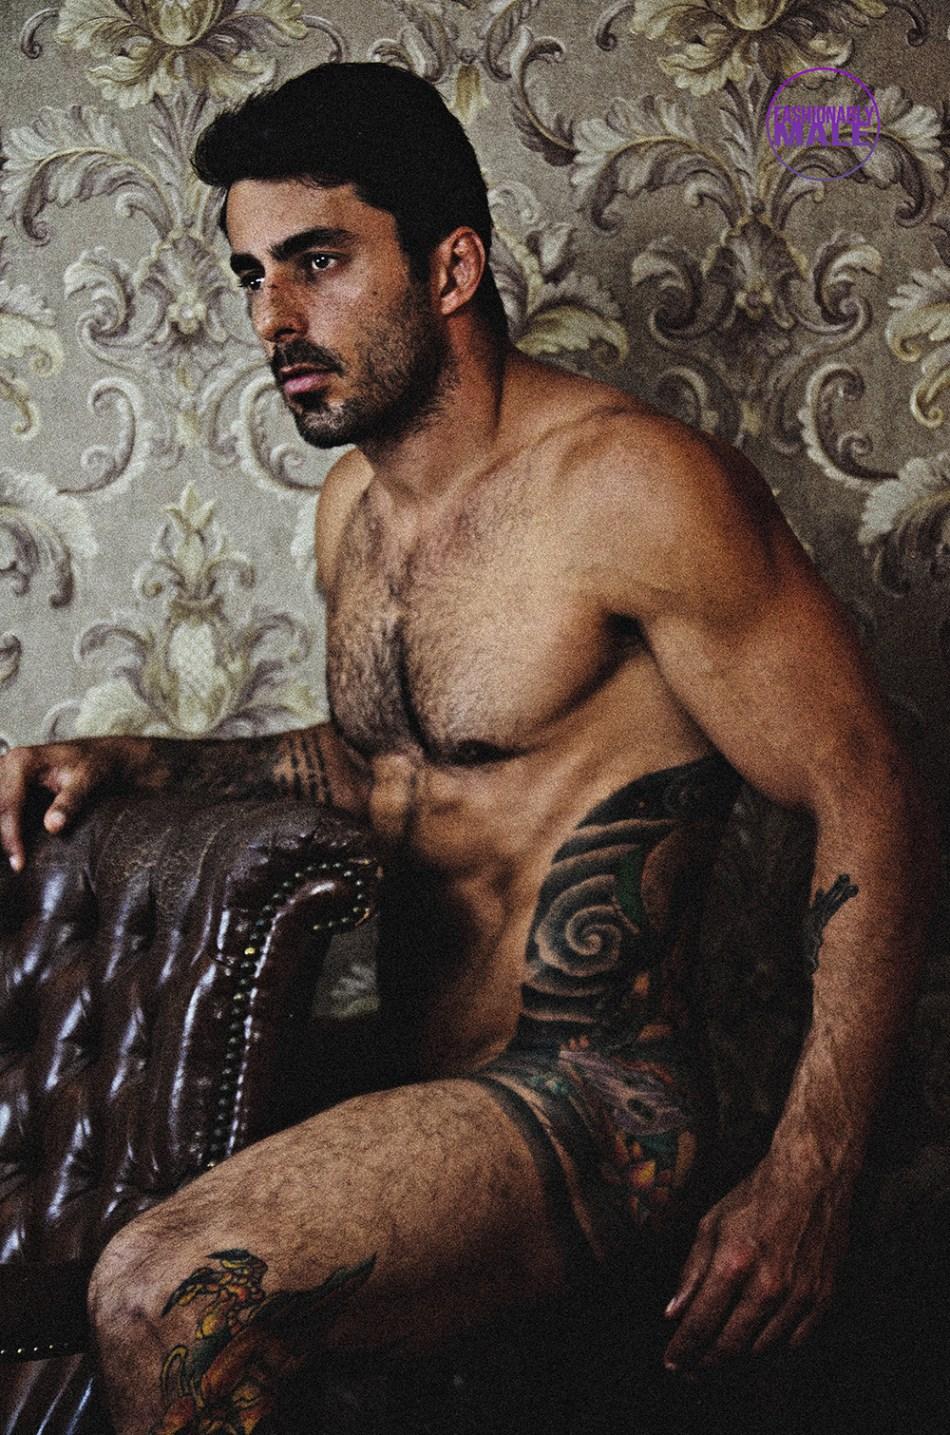 New Exclusive Editorial by Felipe Pilotto with Rodrigo Conte